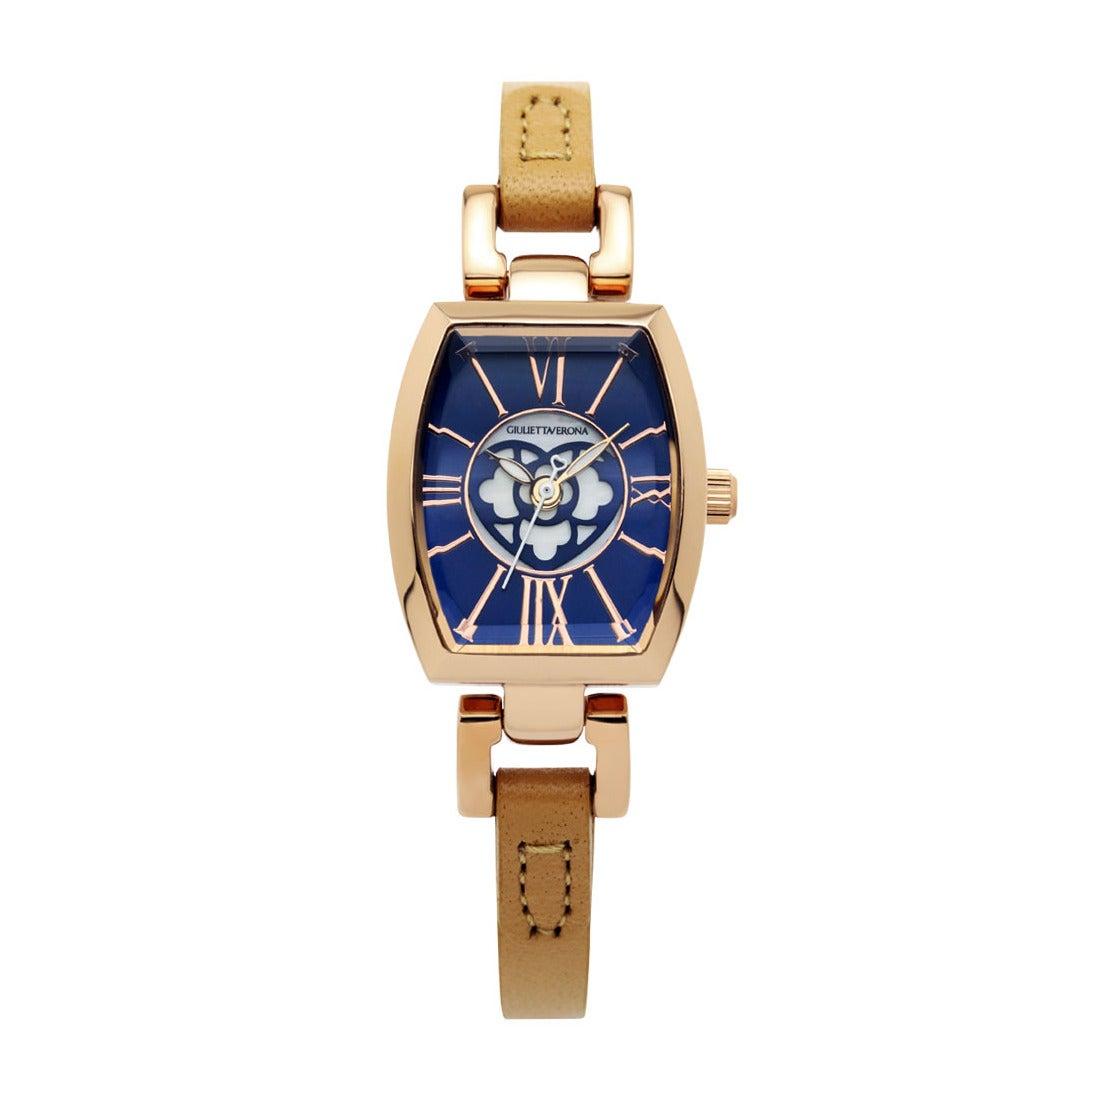 【SAC'S BAR】ジュリエッタヴェローナ GIULIETTAVERONA 腕時計 GV006 LOVE VERONA ネイビー×ライトブラウン